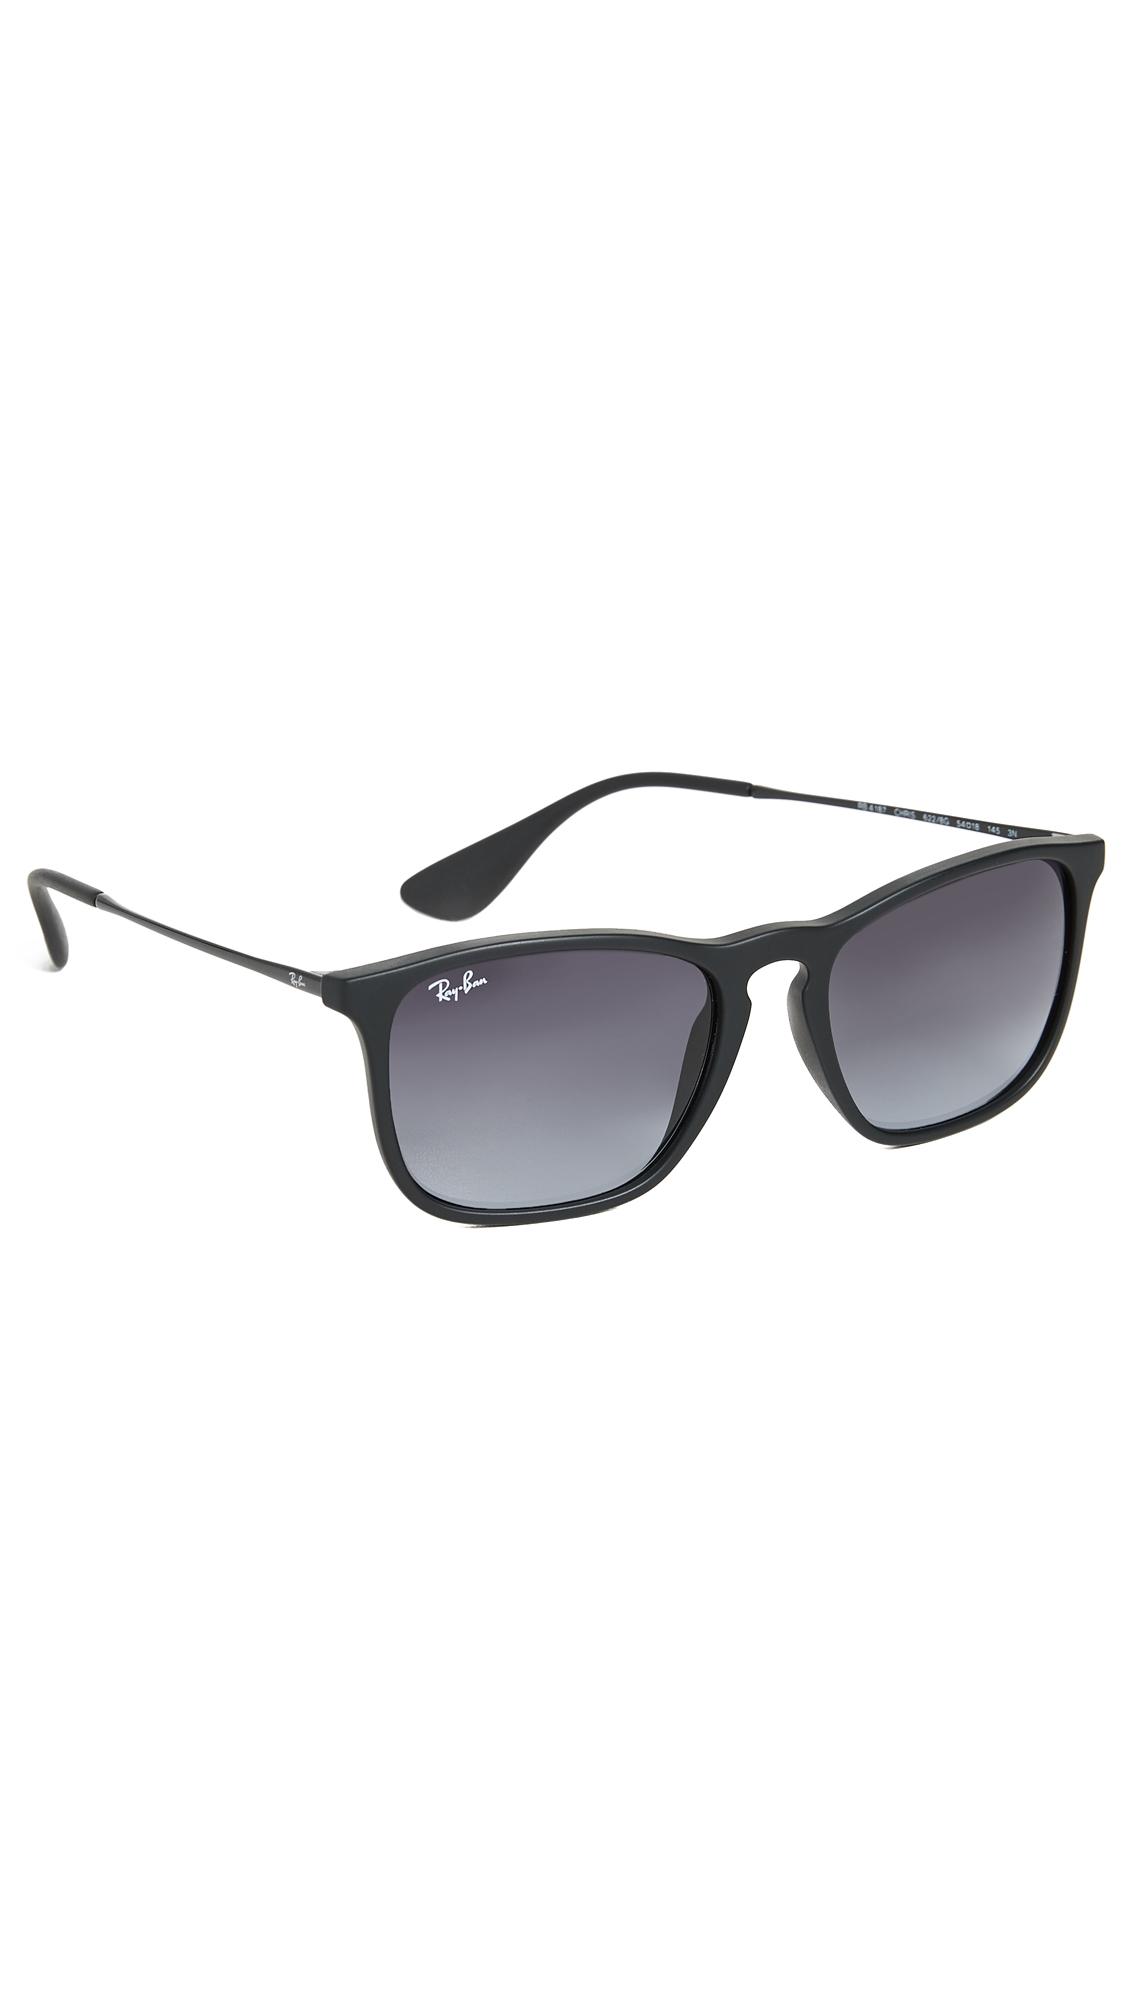 3f8c16292a Ray Ban Ray-Ban Chris Sunglasses